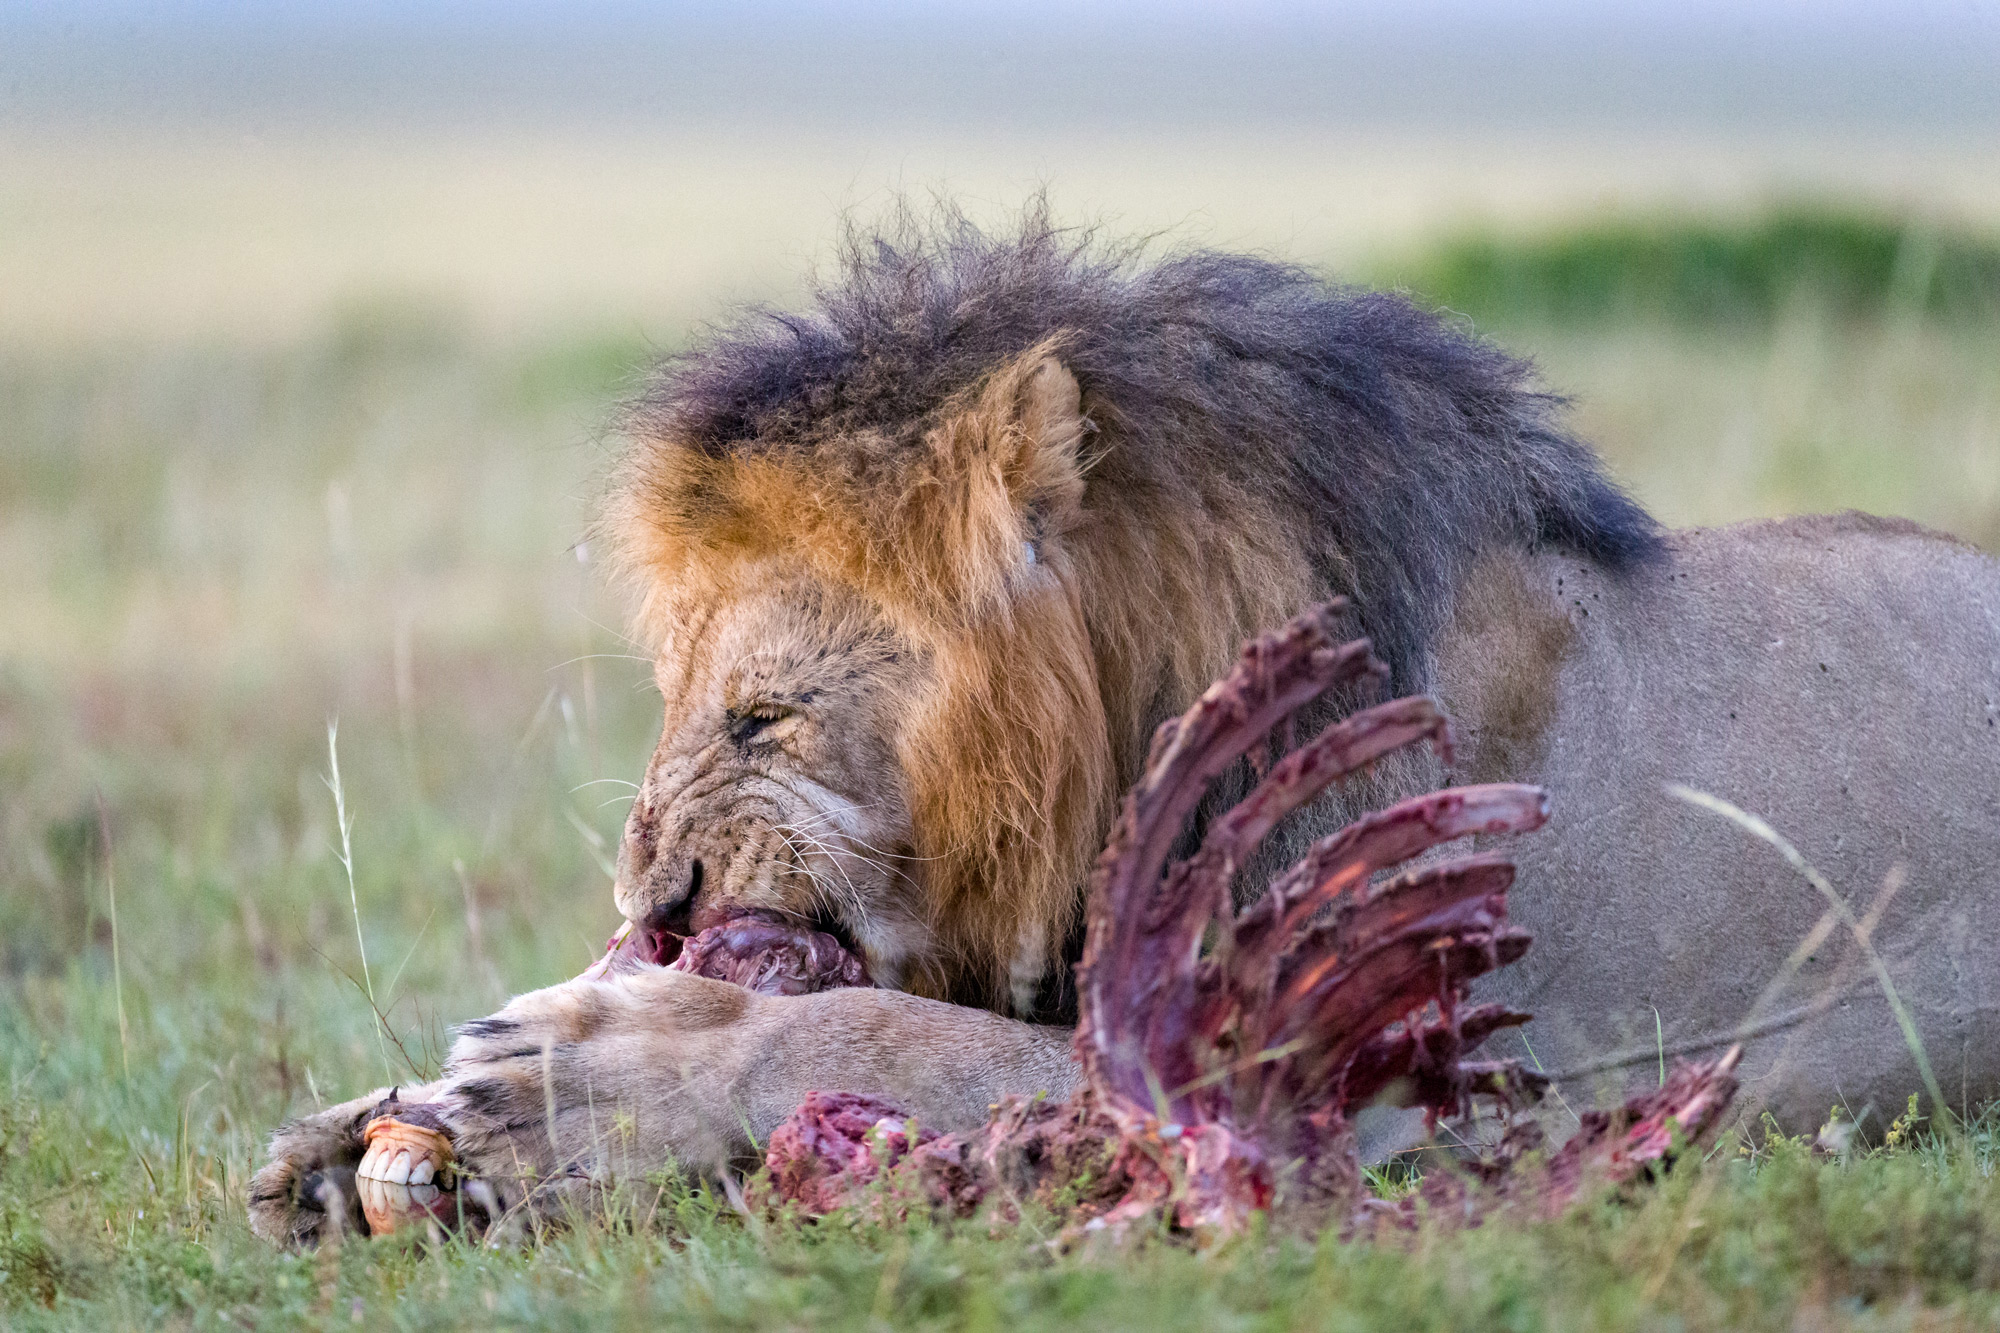 A lion feasts on the remains of a zebra ©Ruzdi Ekenheim